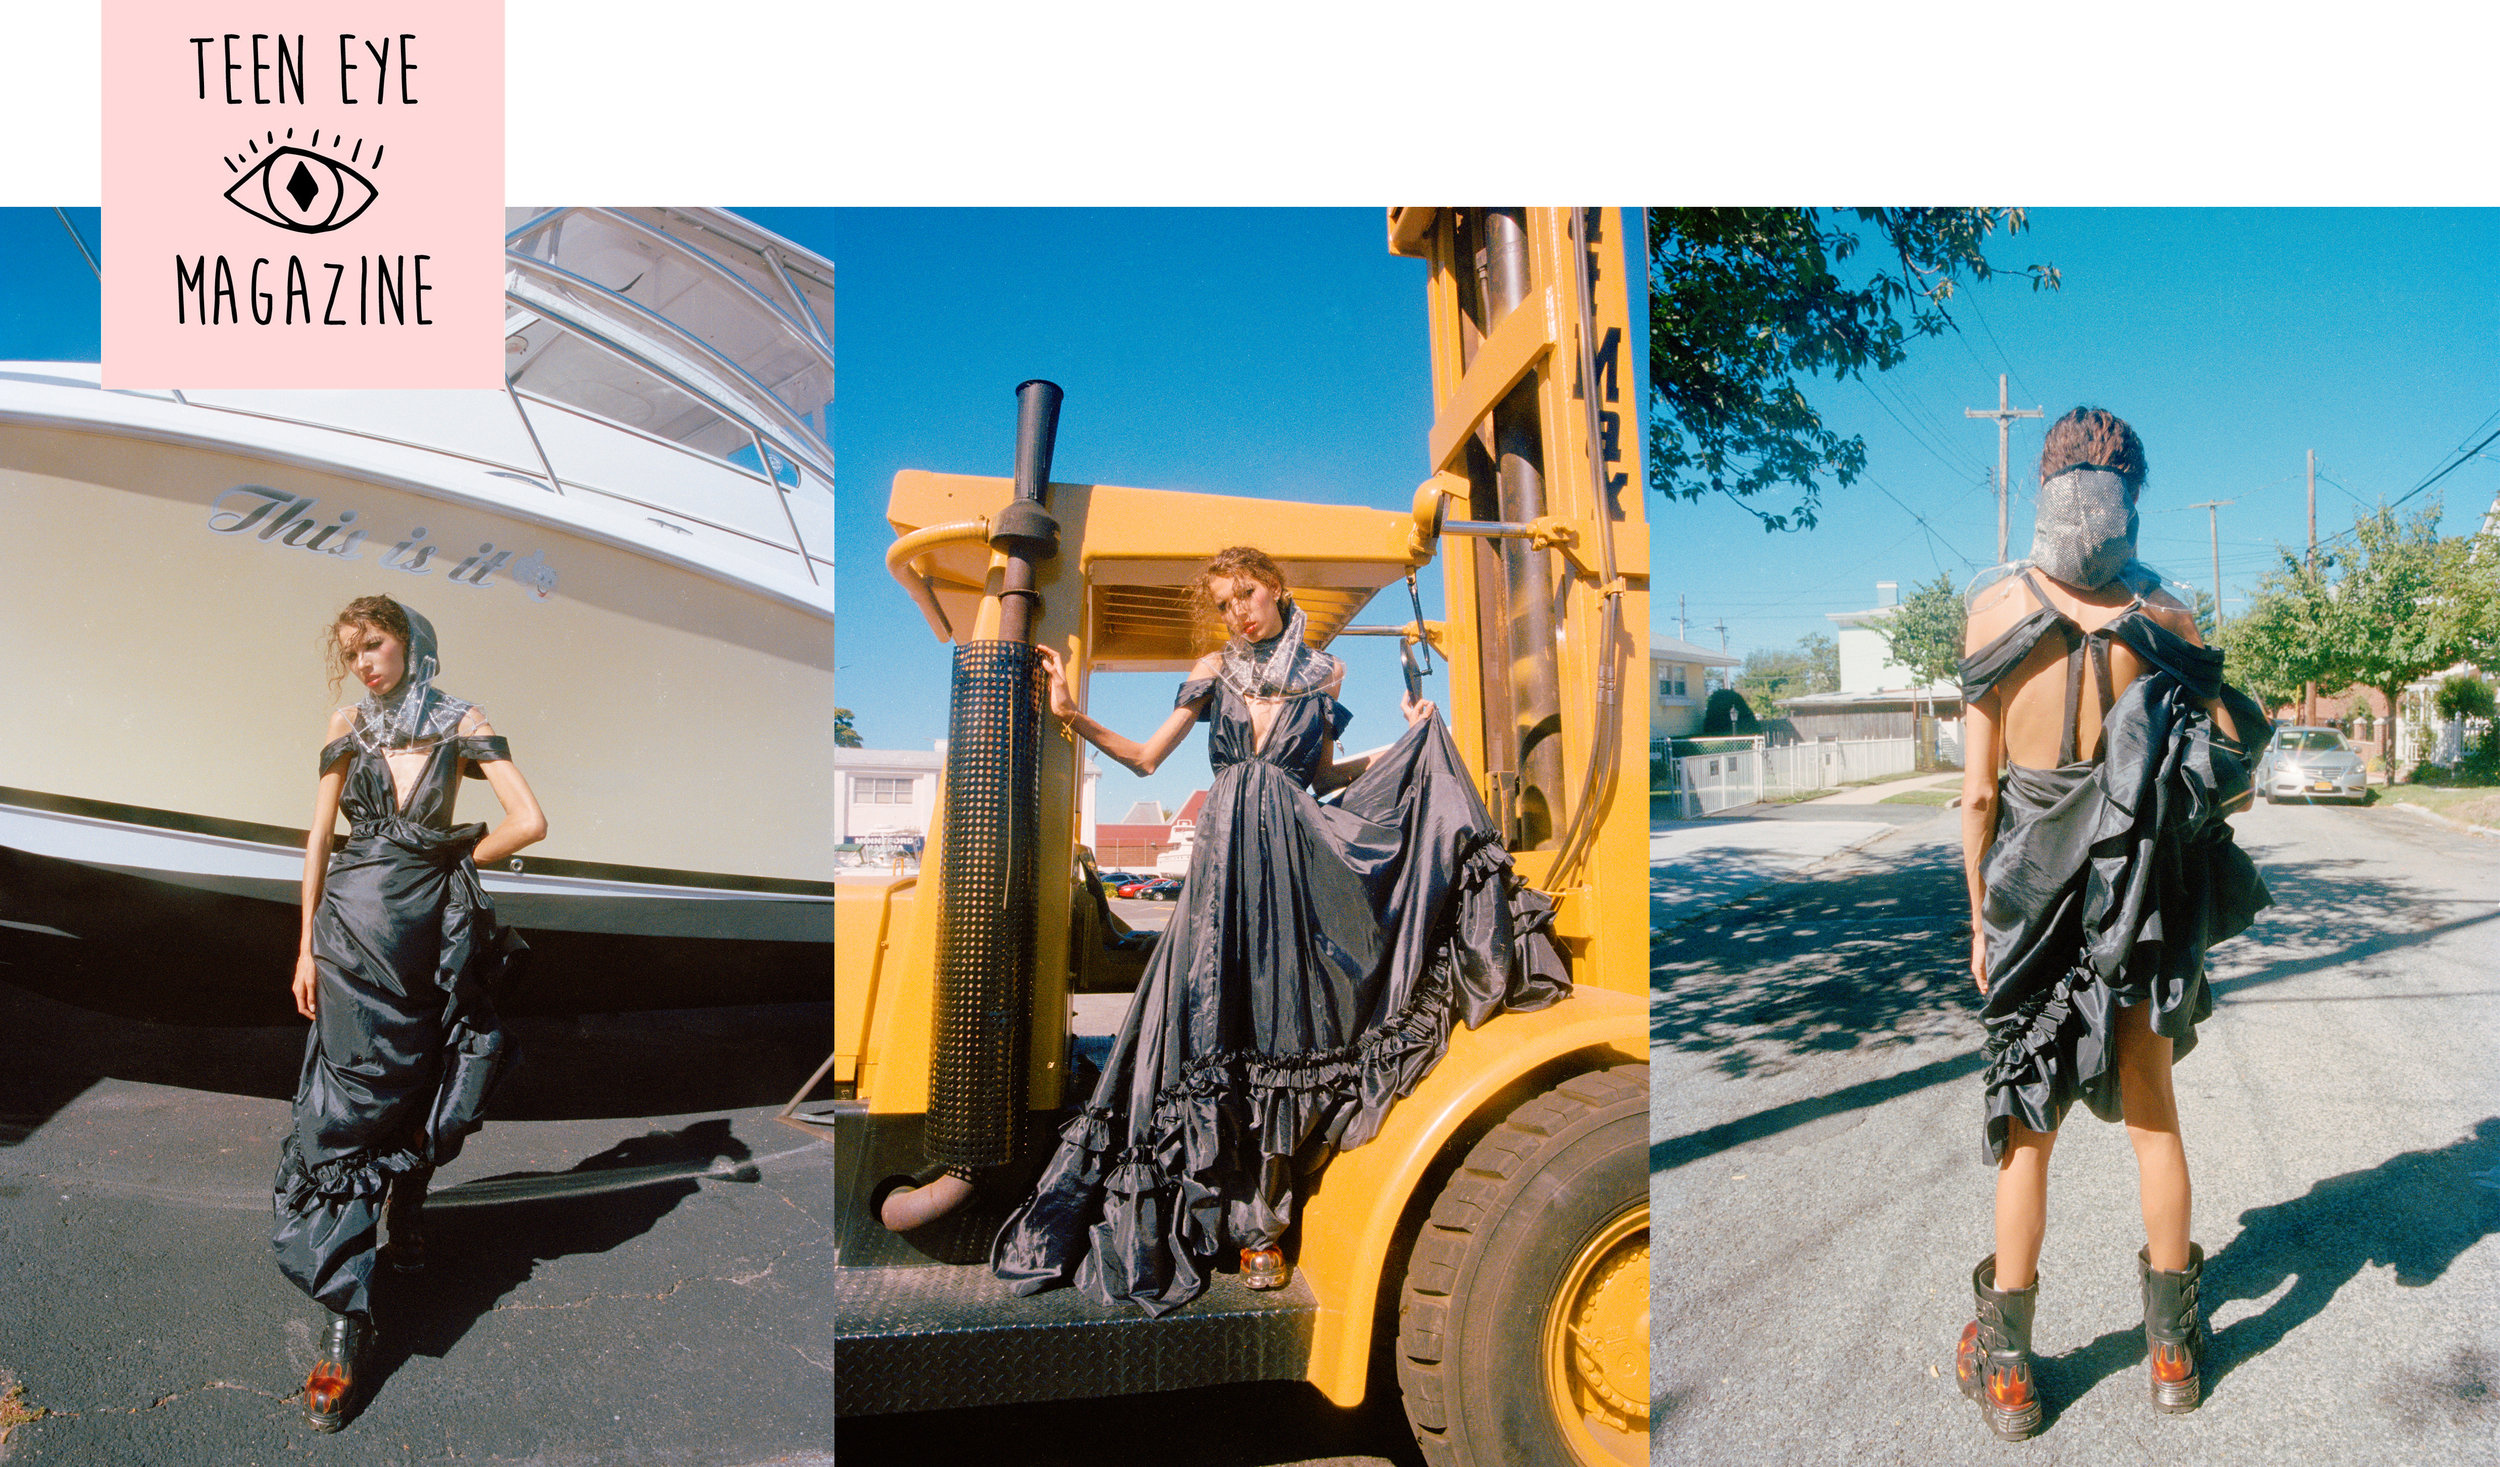 Teen Eye magazine editorial feautre Kelsey Randall navy silk taffeta parachute bustle gown ruffle dress Phia Wilson Emily Odesser Mia Varrone combat boots construction site bulldozer boat made-to-measure luxury bespoke custom womenswear made in New York City NYC Brooklyn Bushwick handcrafted red carpet fashion bridal gowns